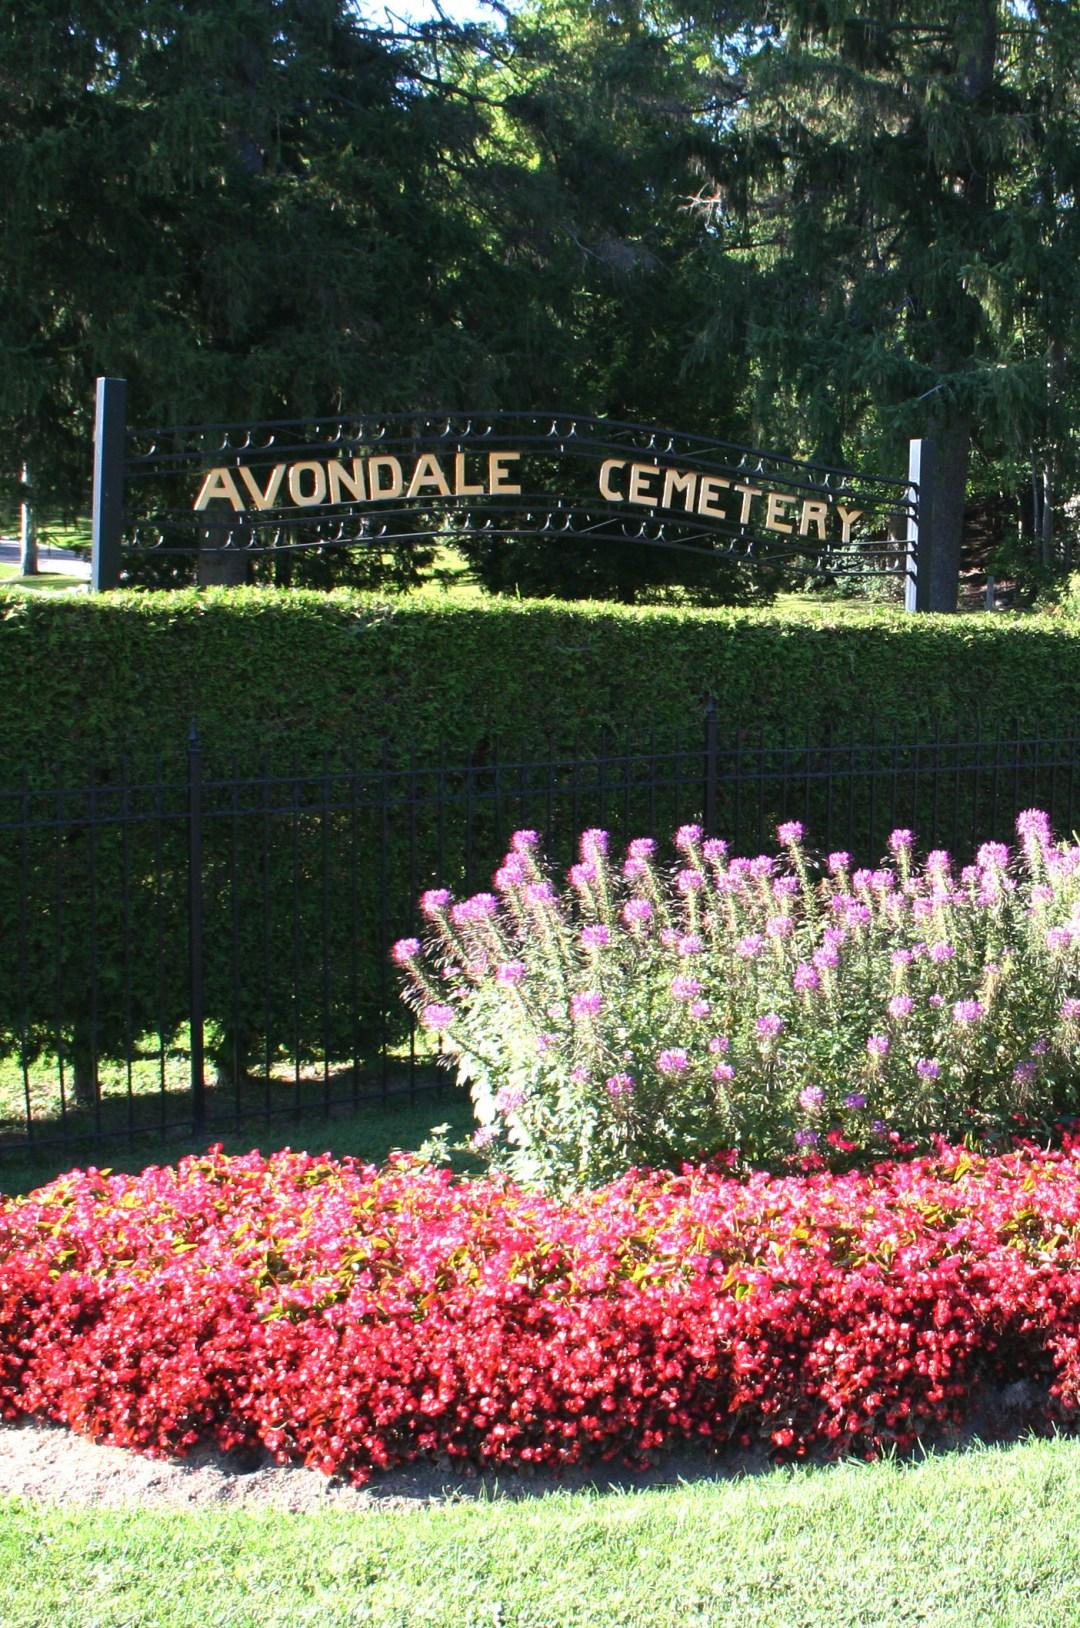 Avondale Cemetery